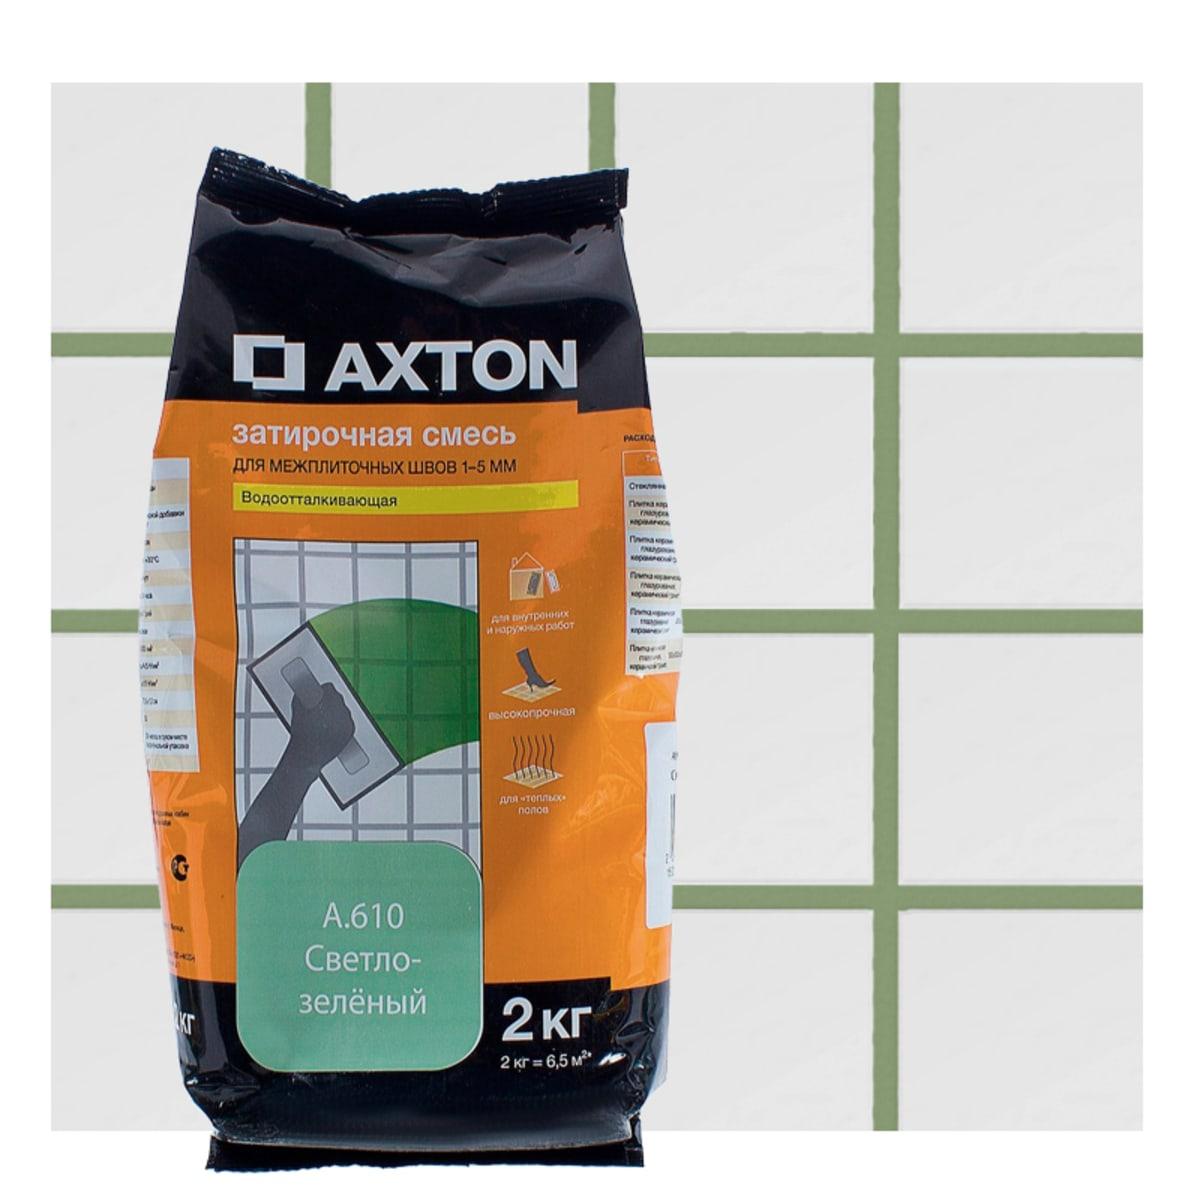 Затирка цементная Axton А.610 2 кг цвет светло-зеленый